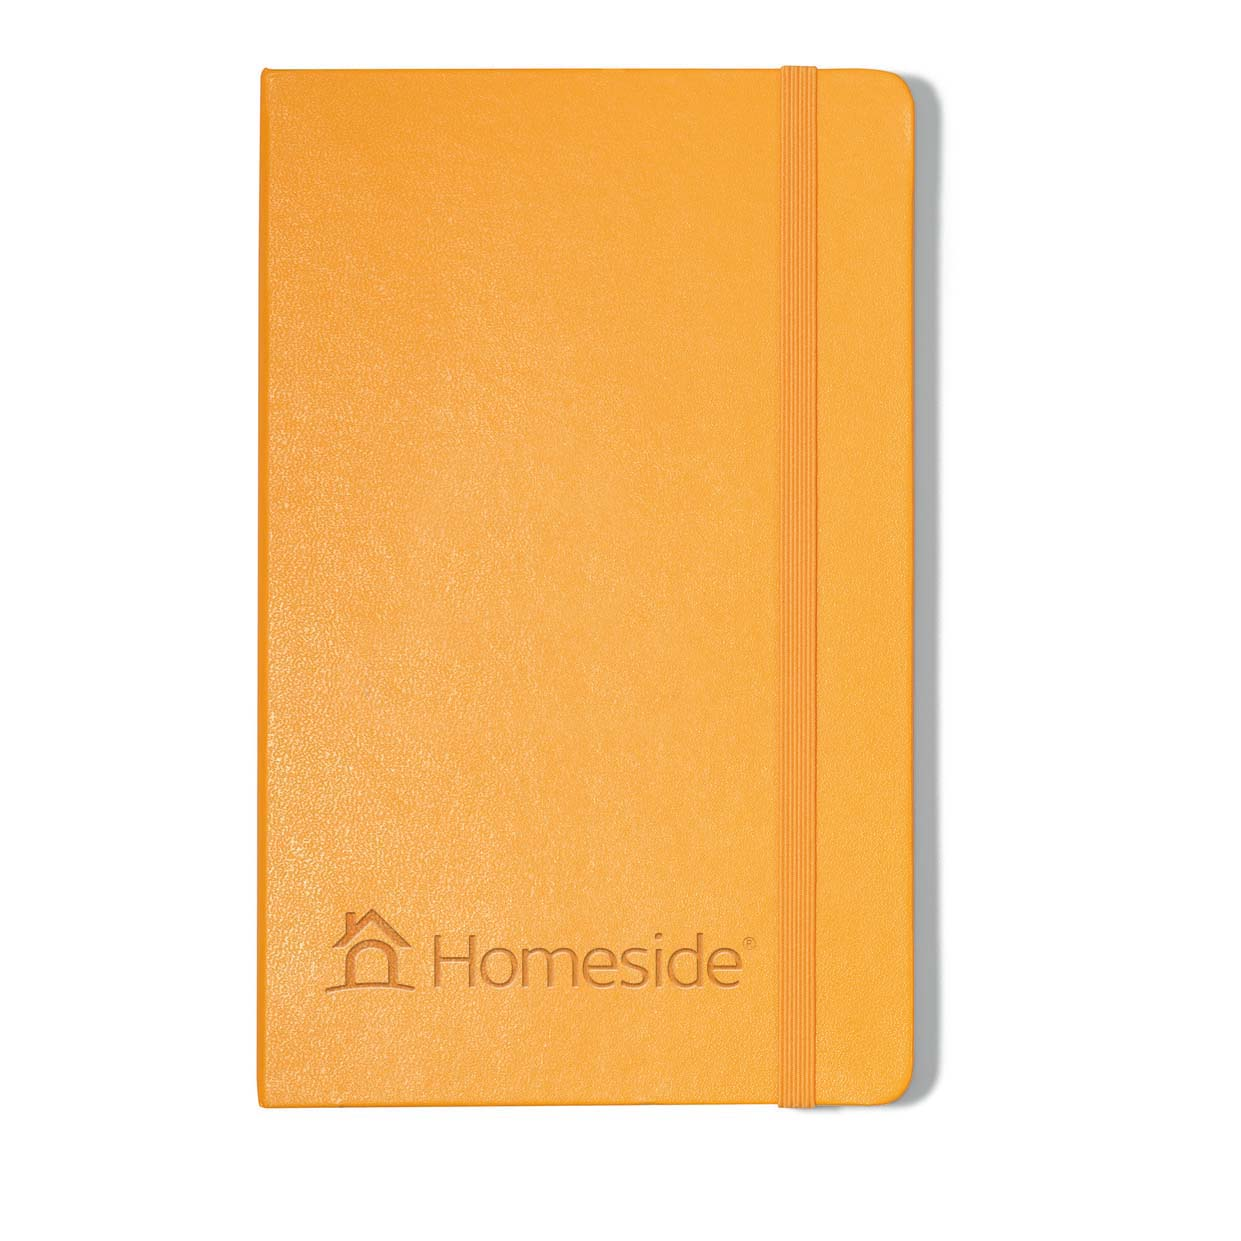 Orange hardcover notebook hs